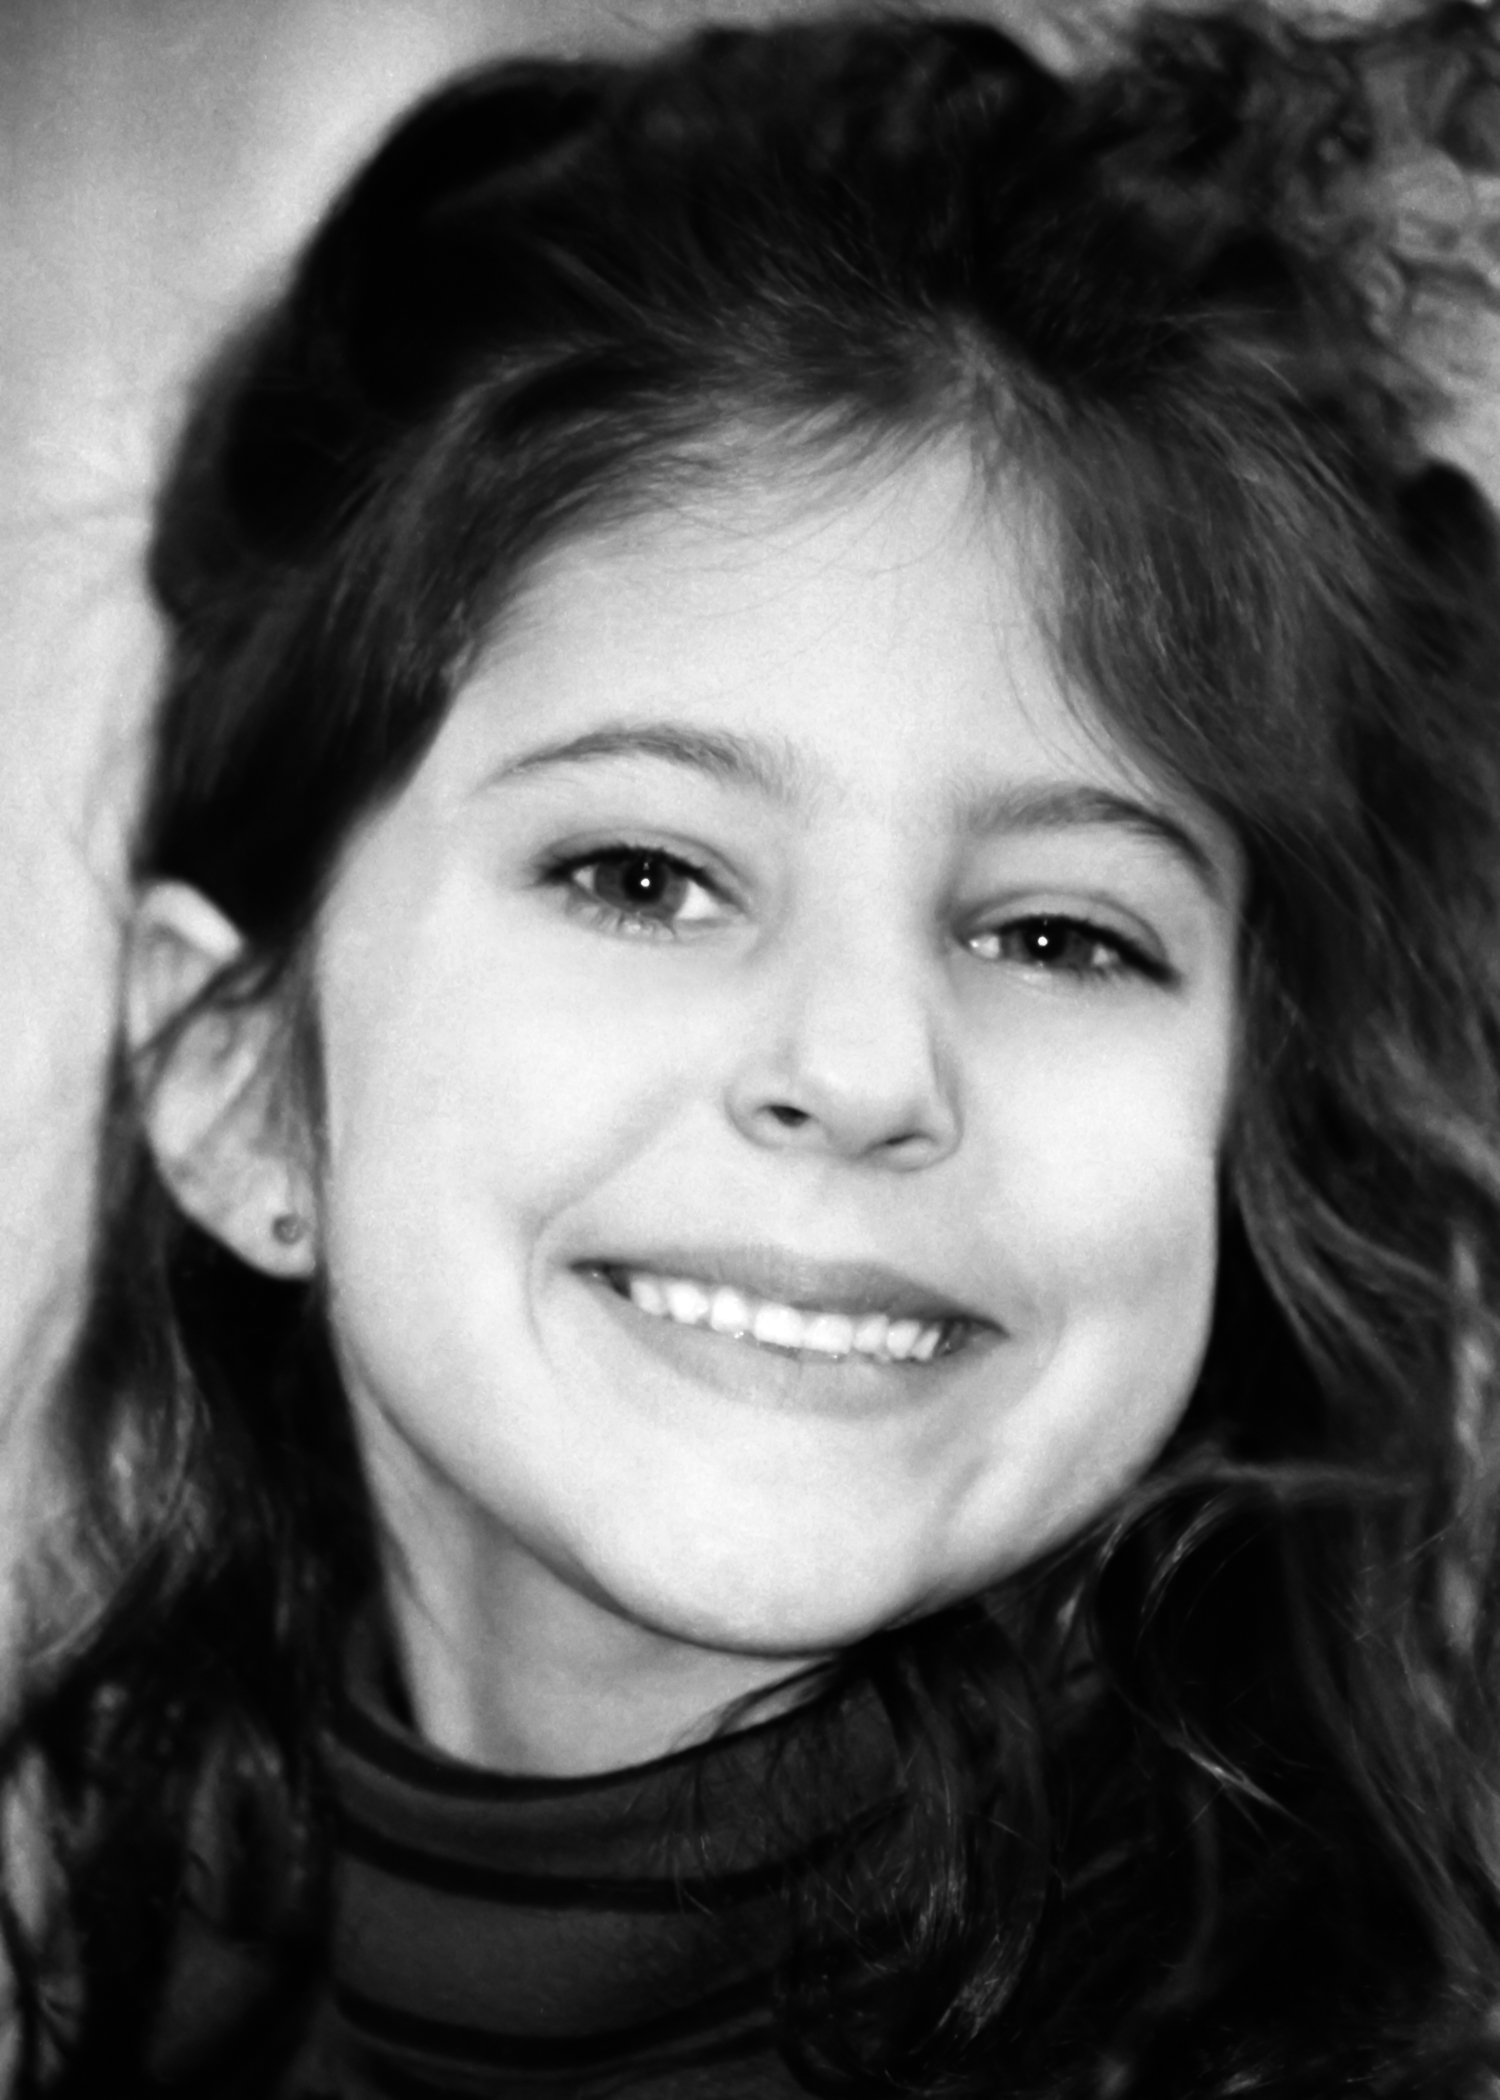 Amanda '98